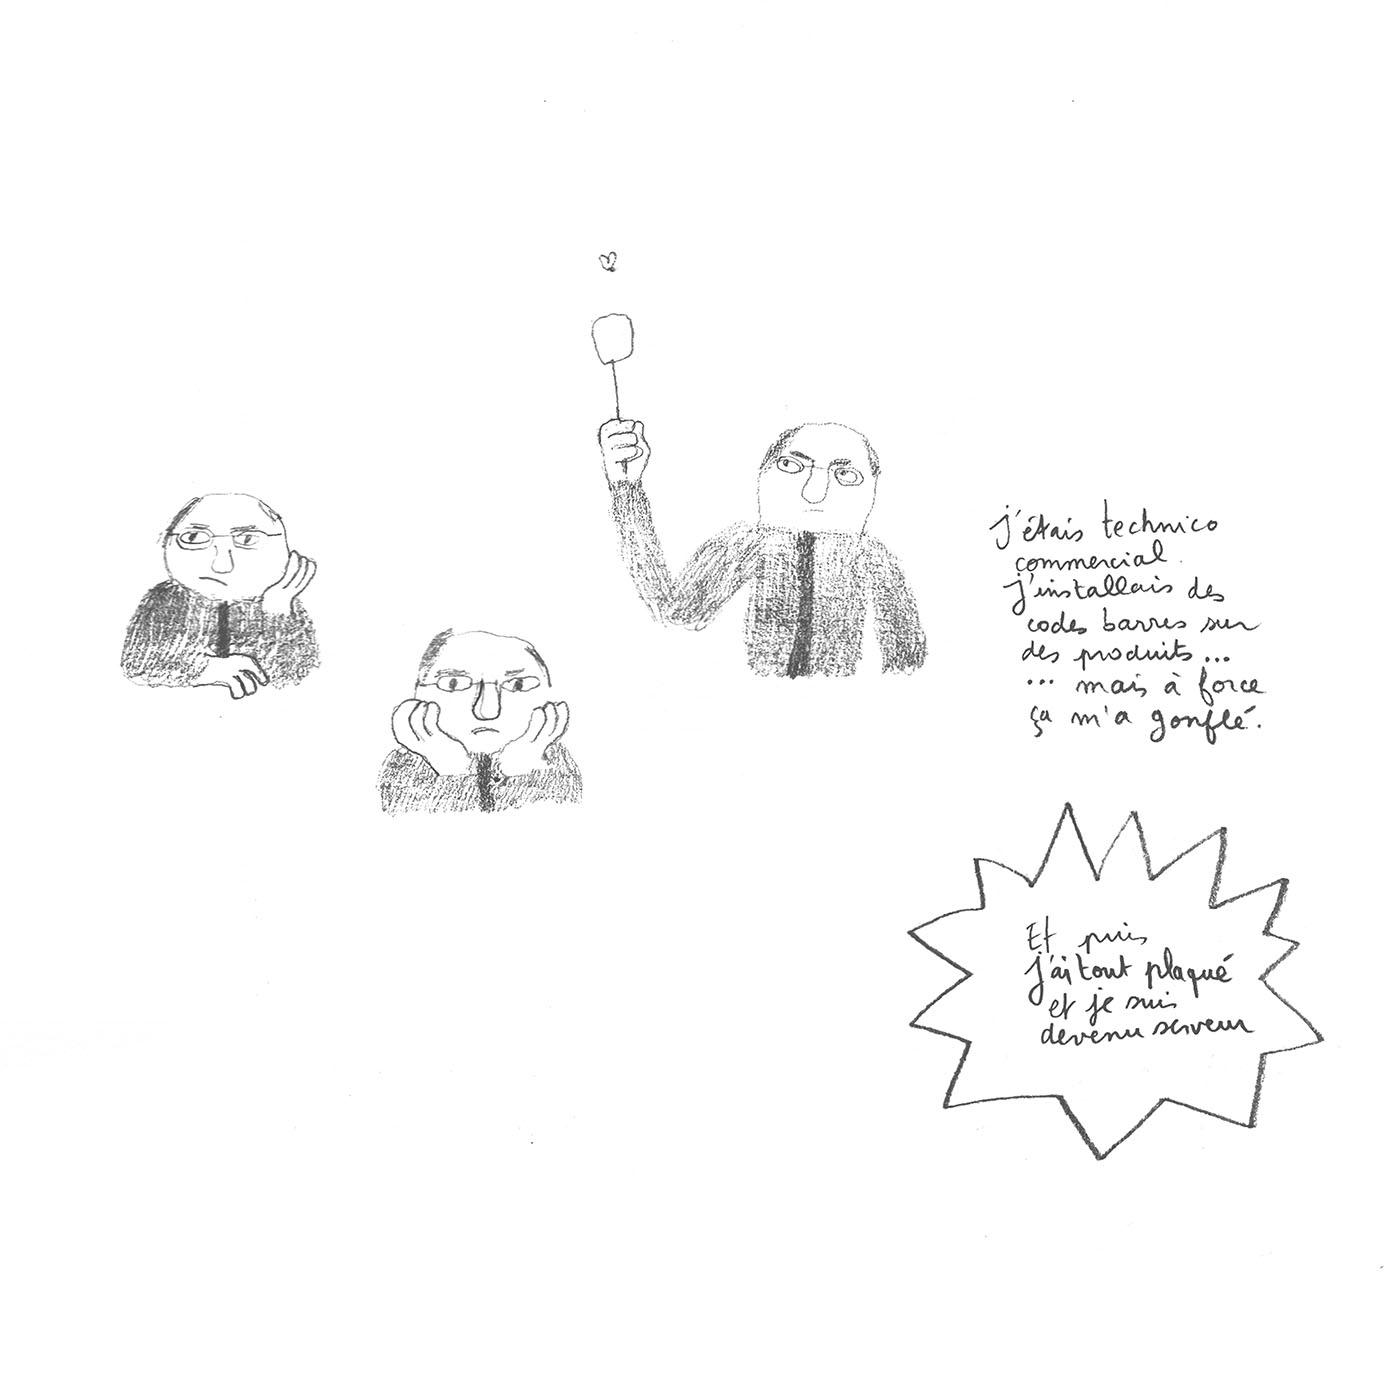 Serge Borras Reveil Creatif illustration2